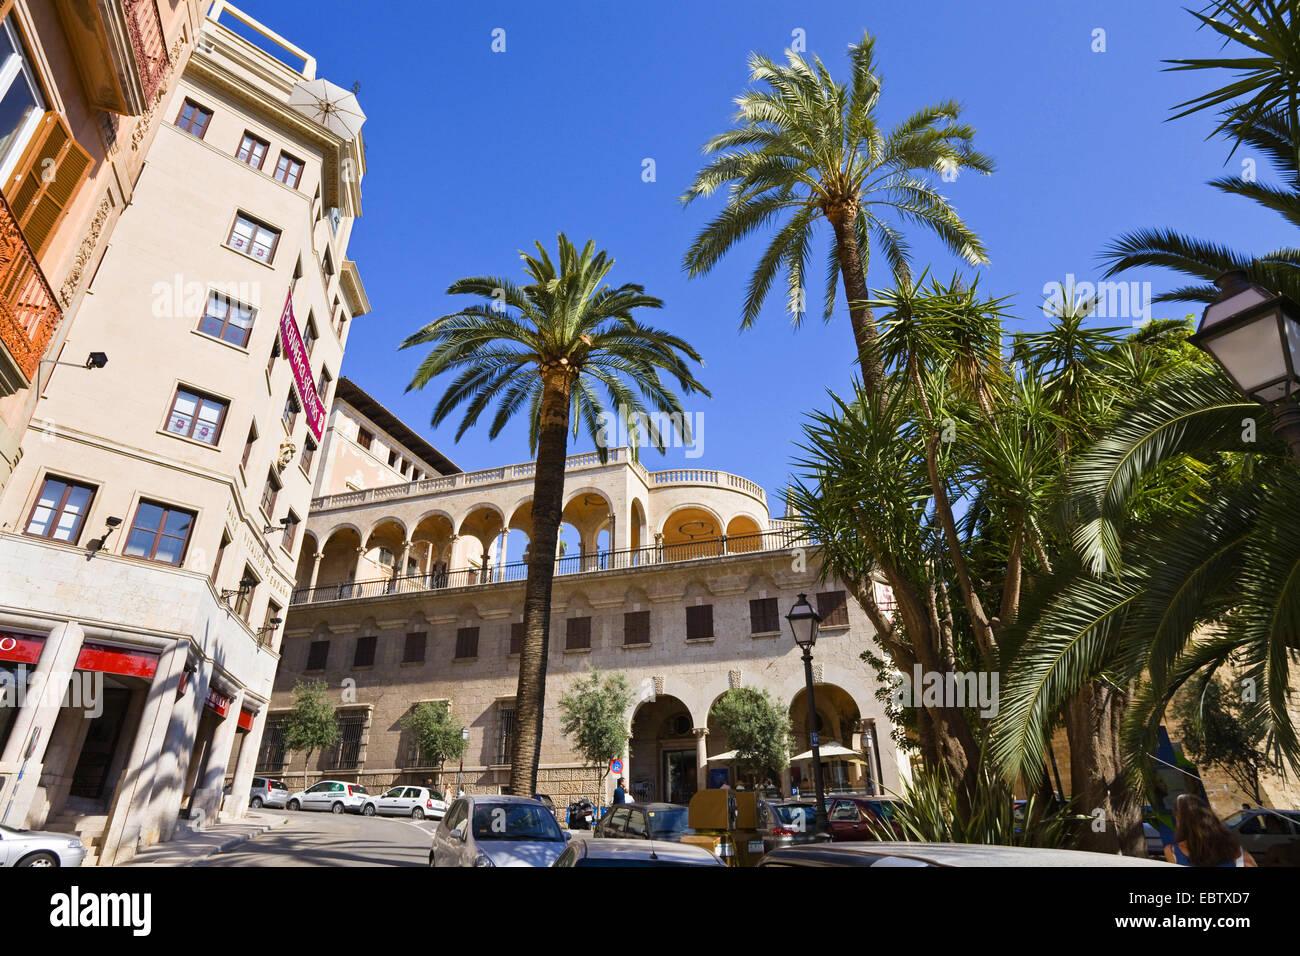 Palau March, Spain, Balearen, Majorca, Palma - Stock Image